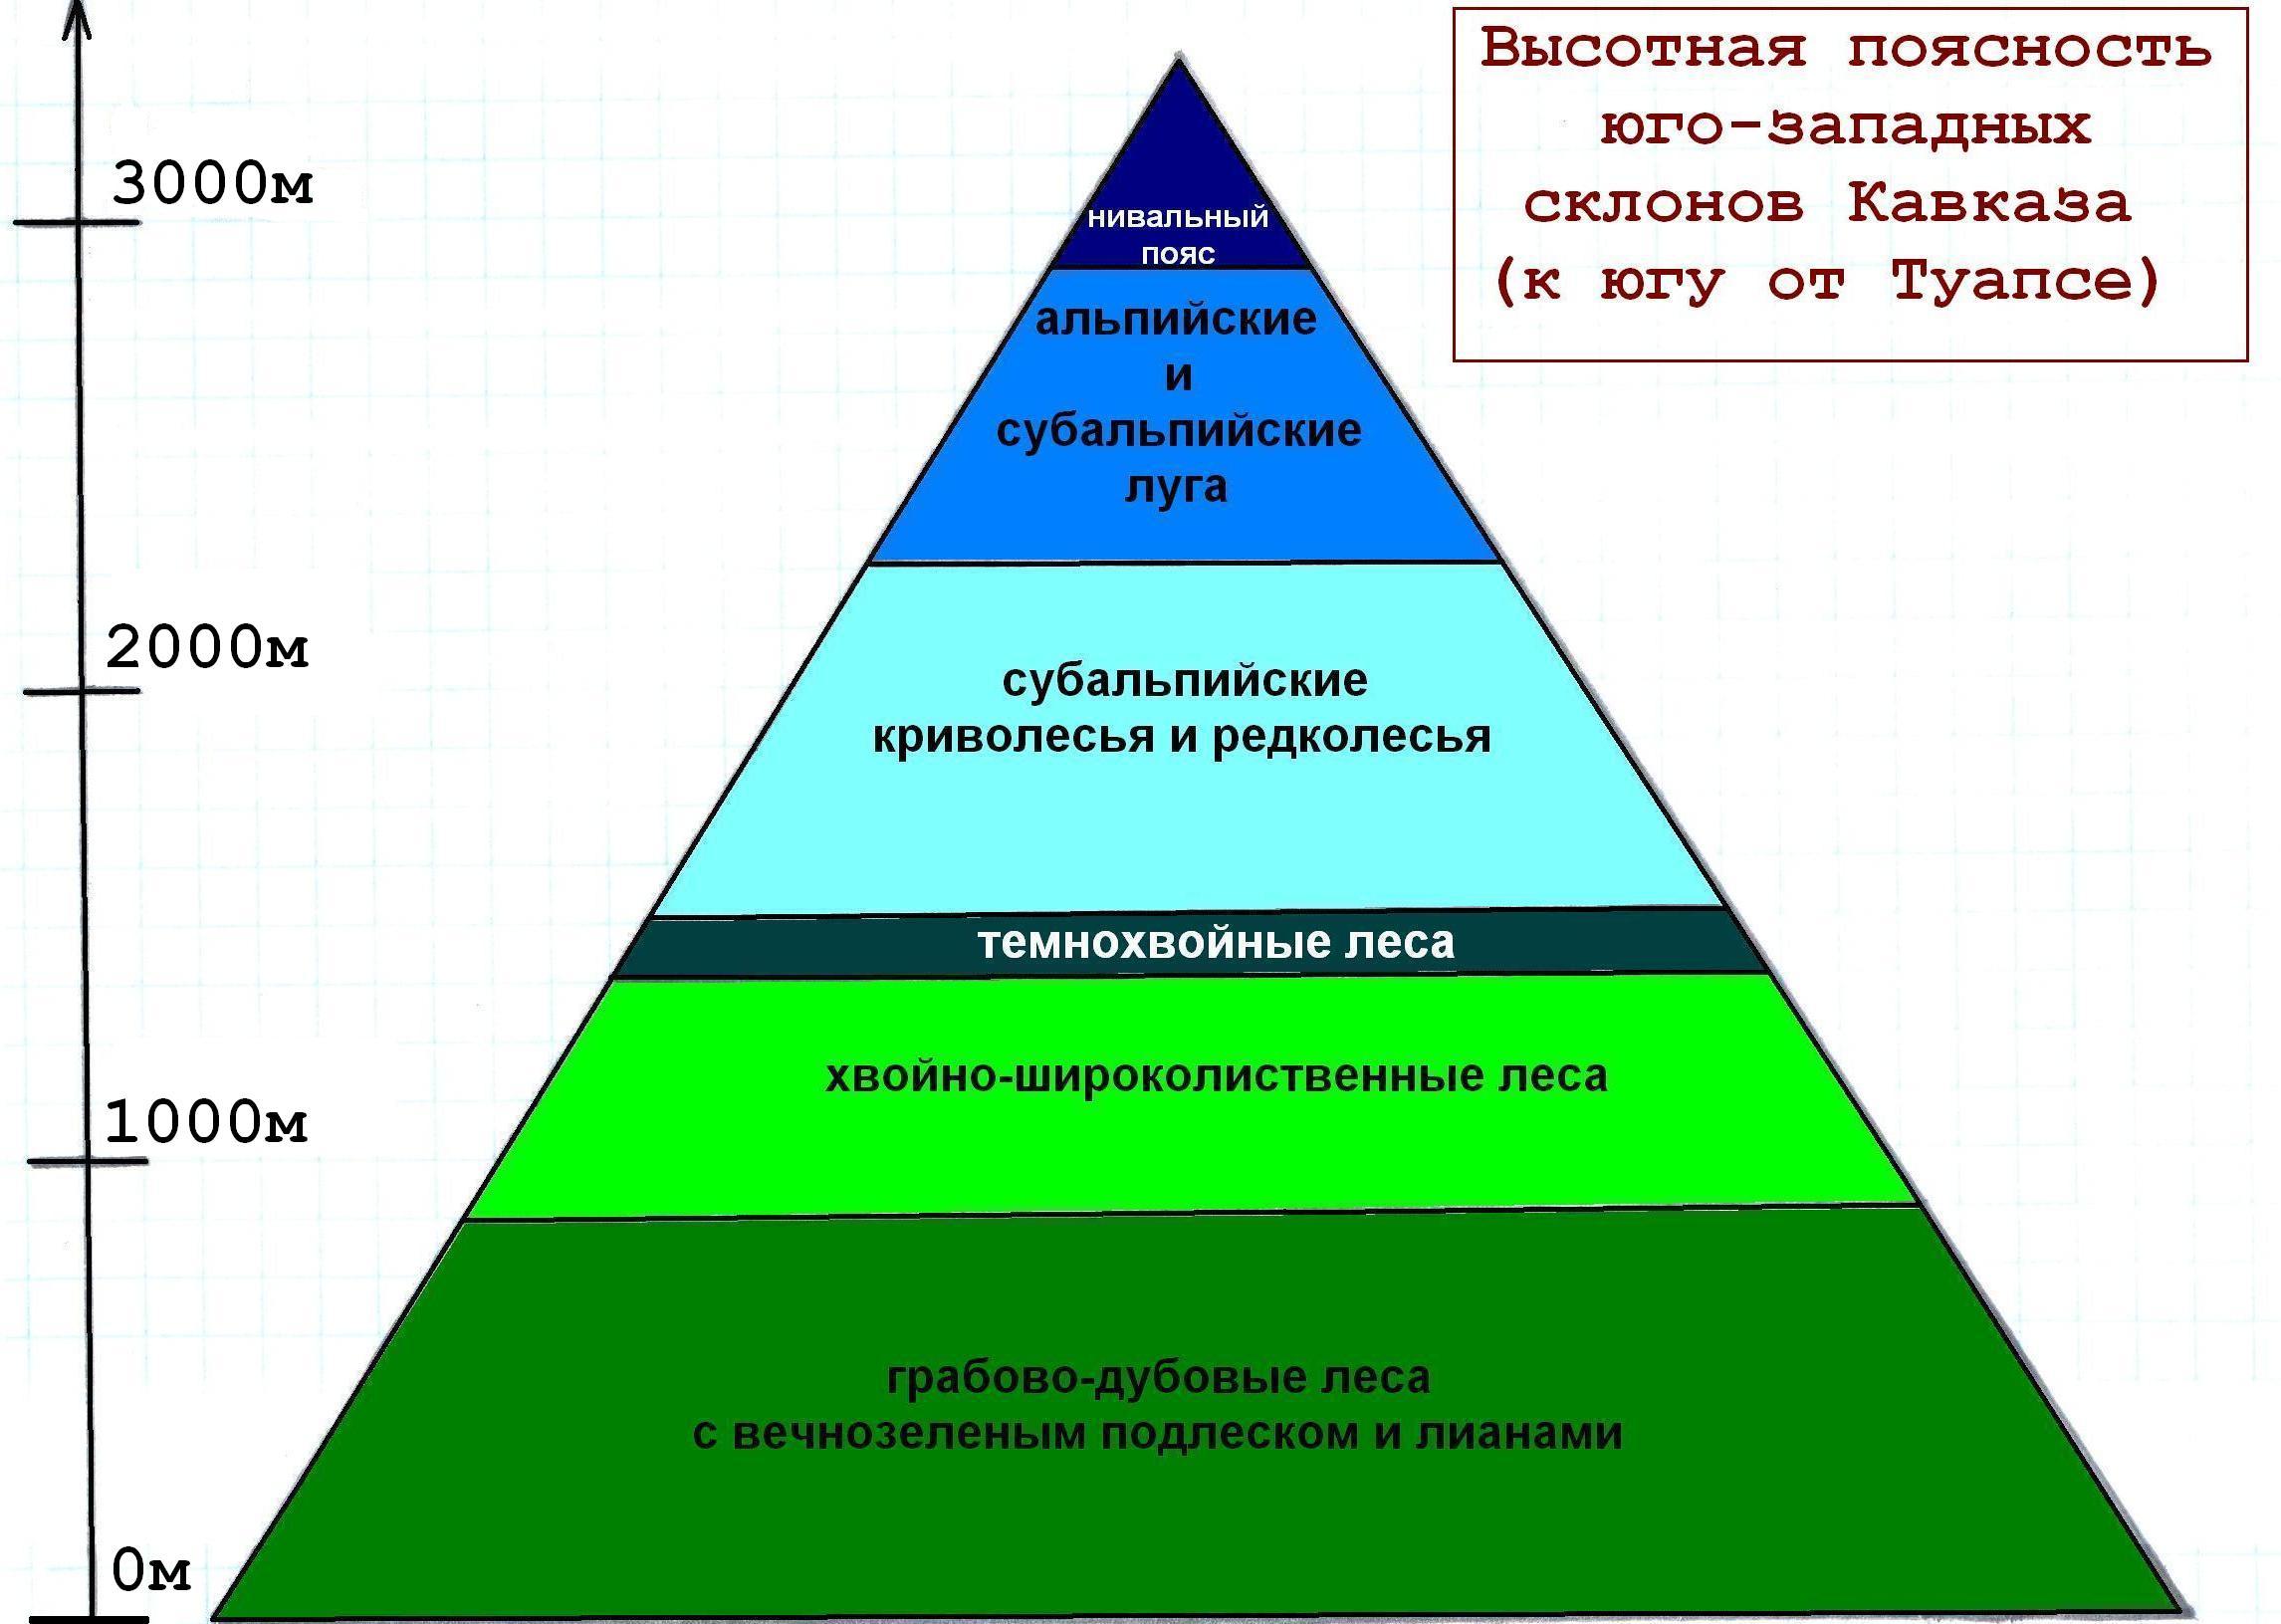 кавказские горы презентация